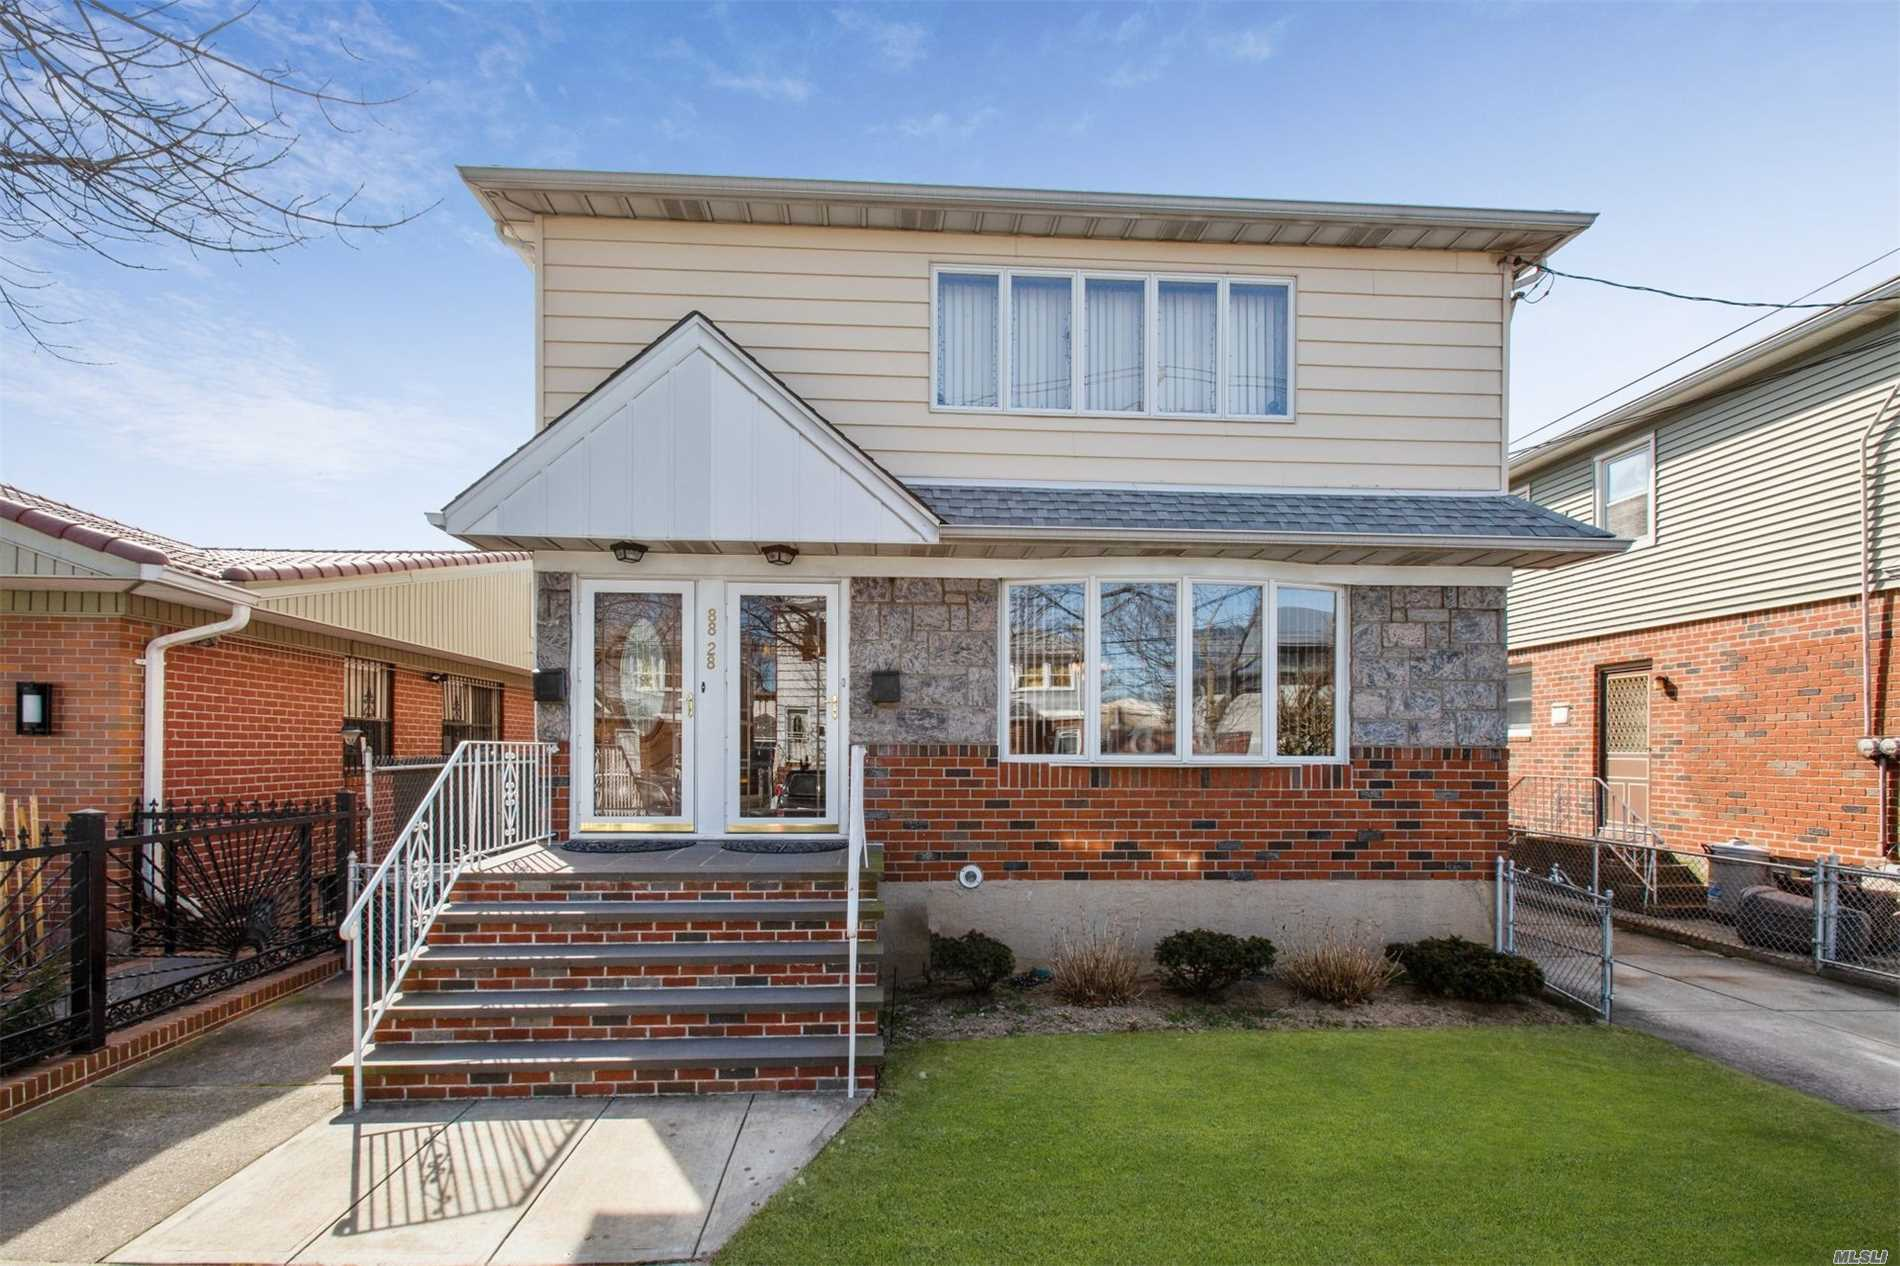 Property for sale at 88-28 Spritz Road, Ozone Park NY 11417, Ozone Park,  New York 11417